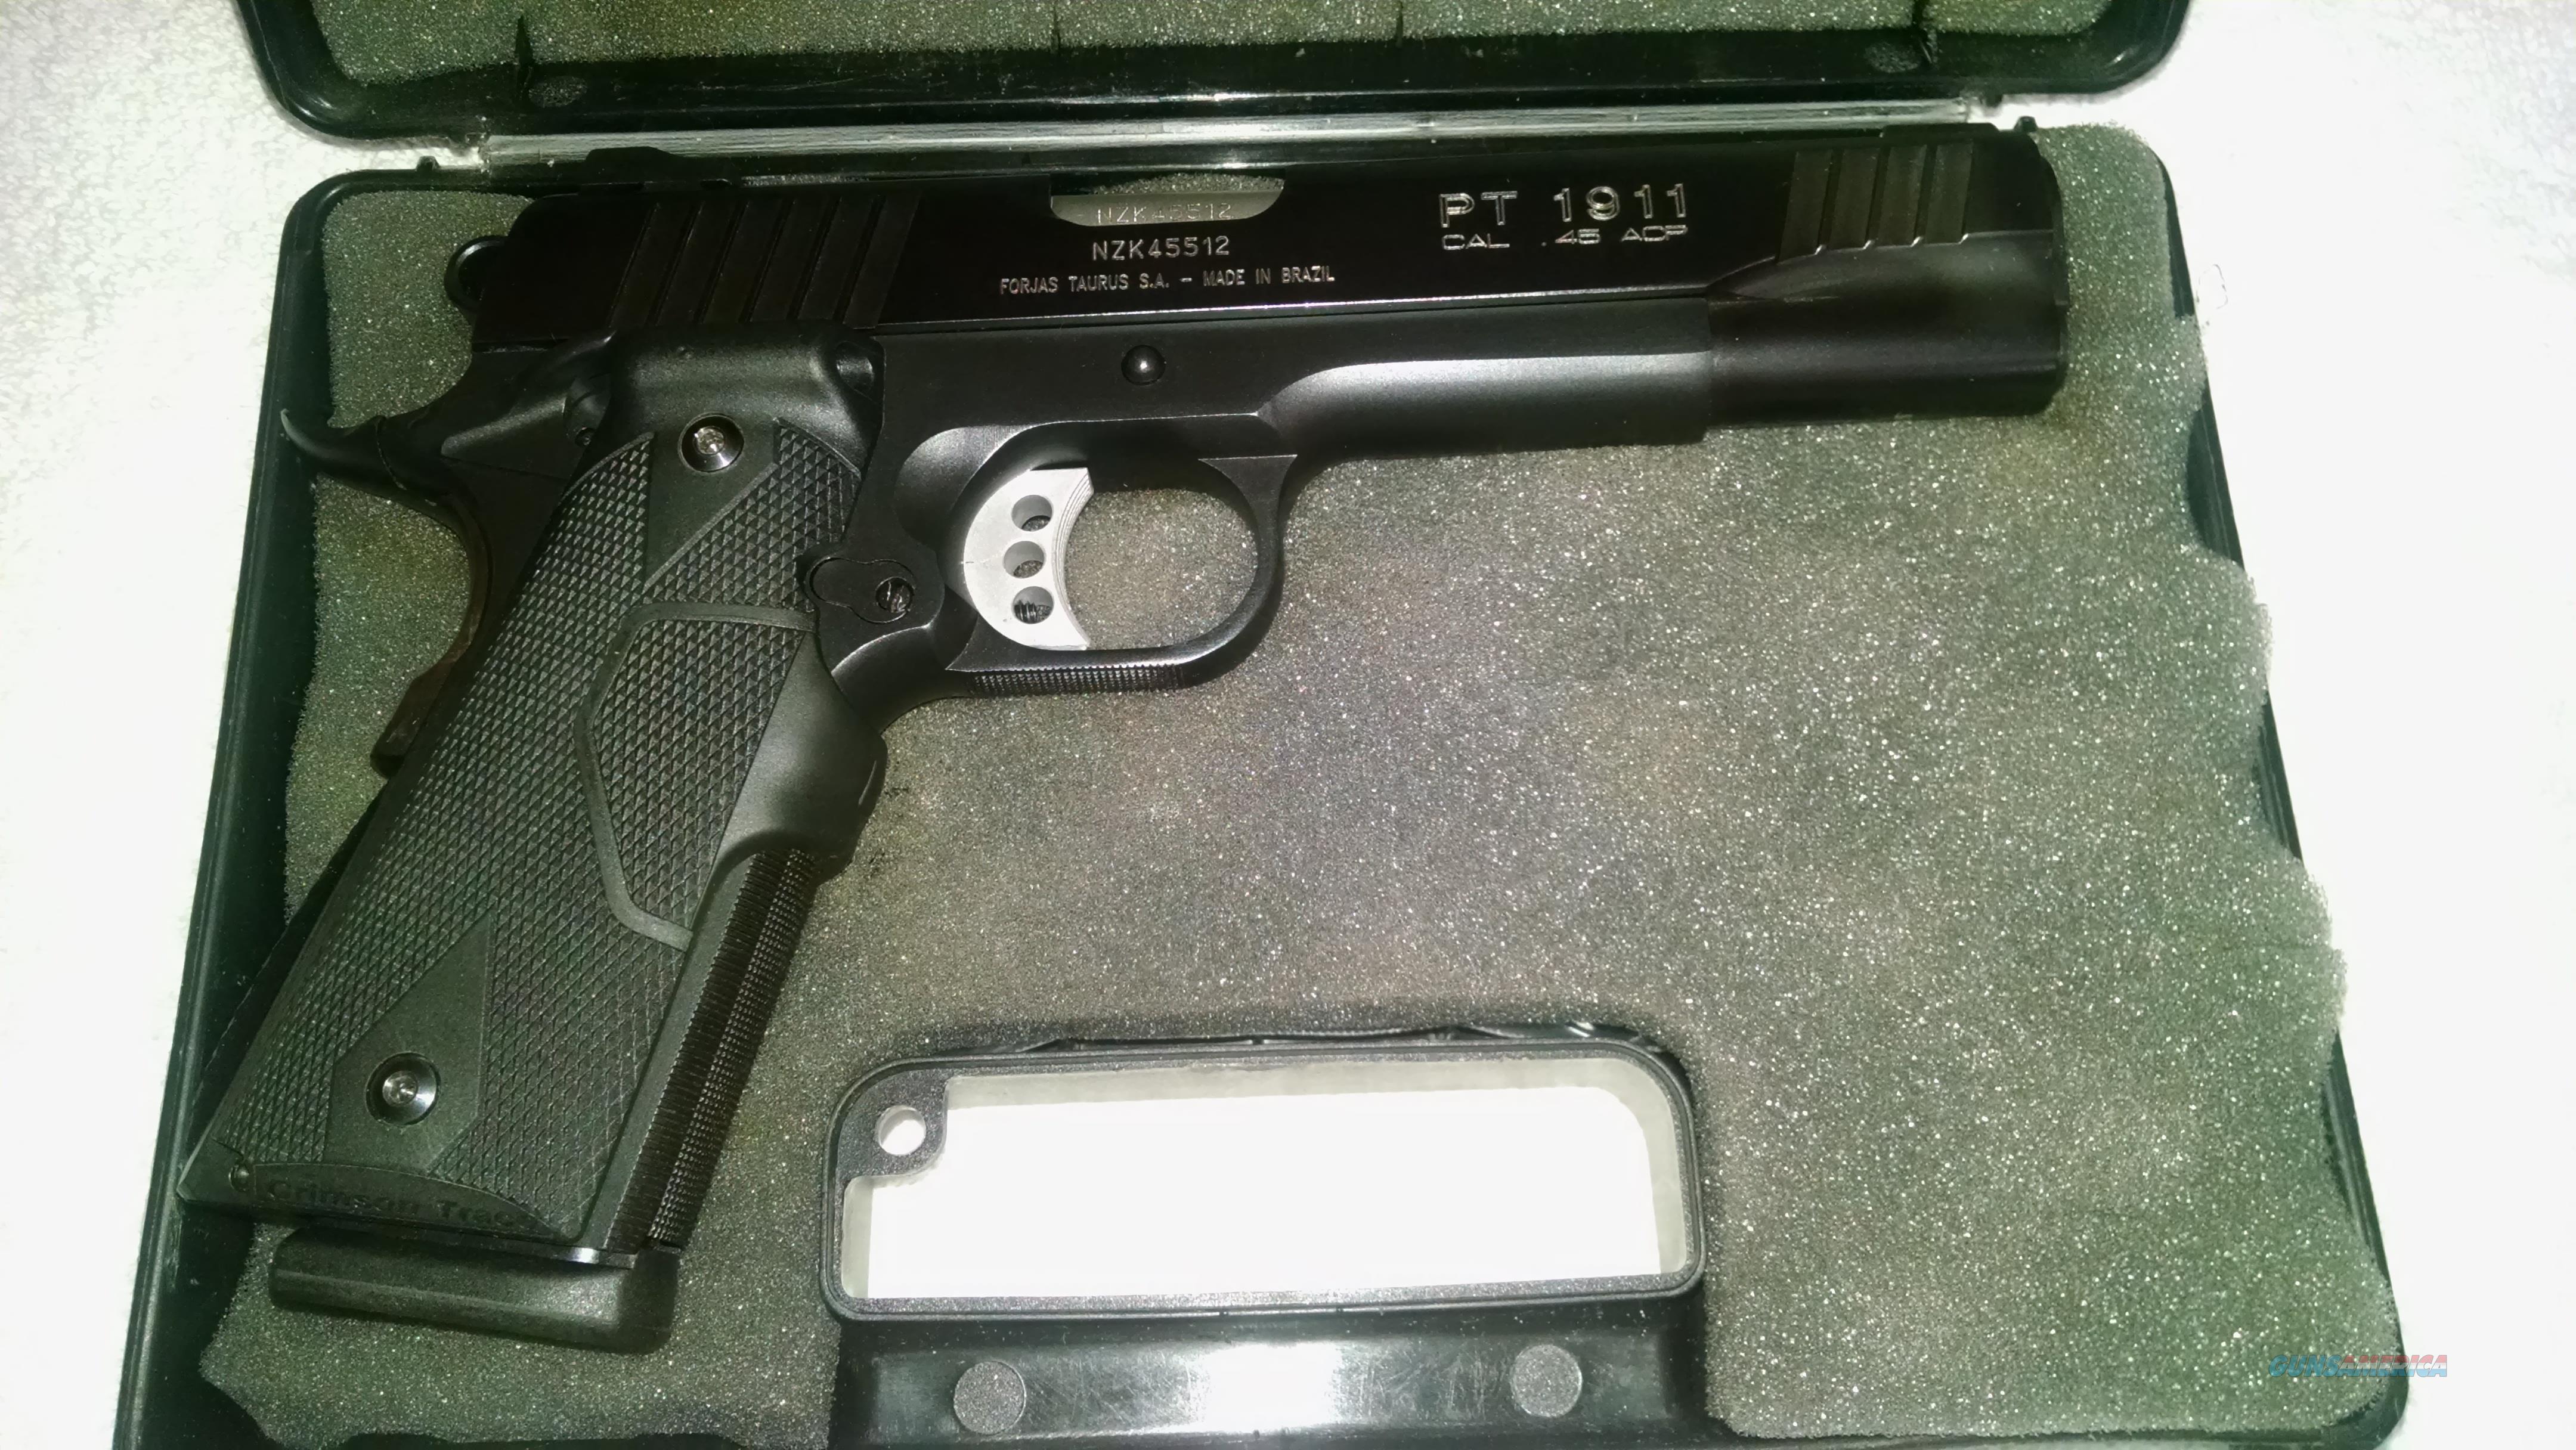 Taurus PT 1911 Homeland Defender  Guns > Pistols > Taurus Pistols > Semi Auto Pistols > Steel Frame